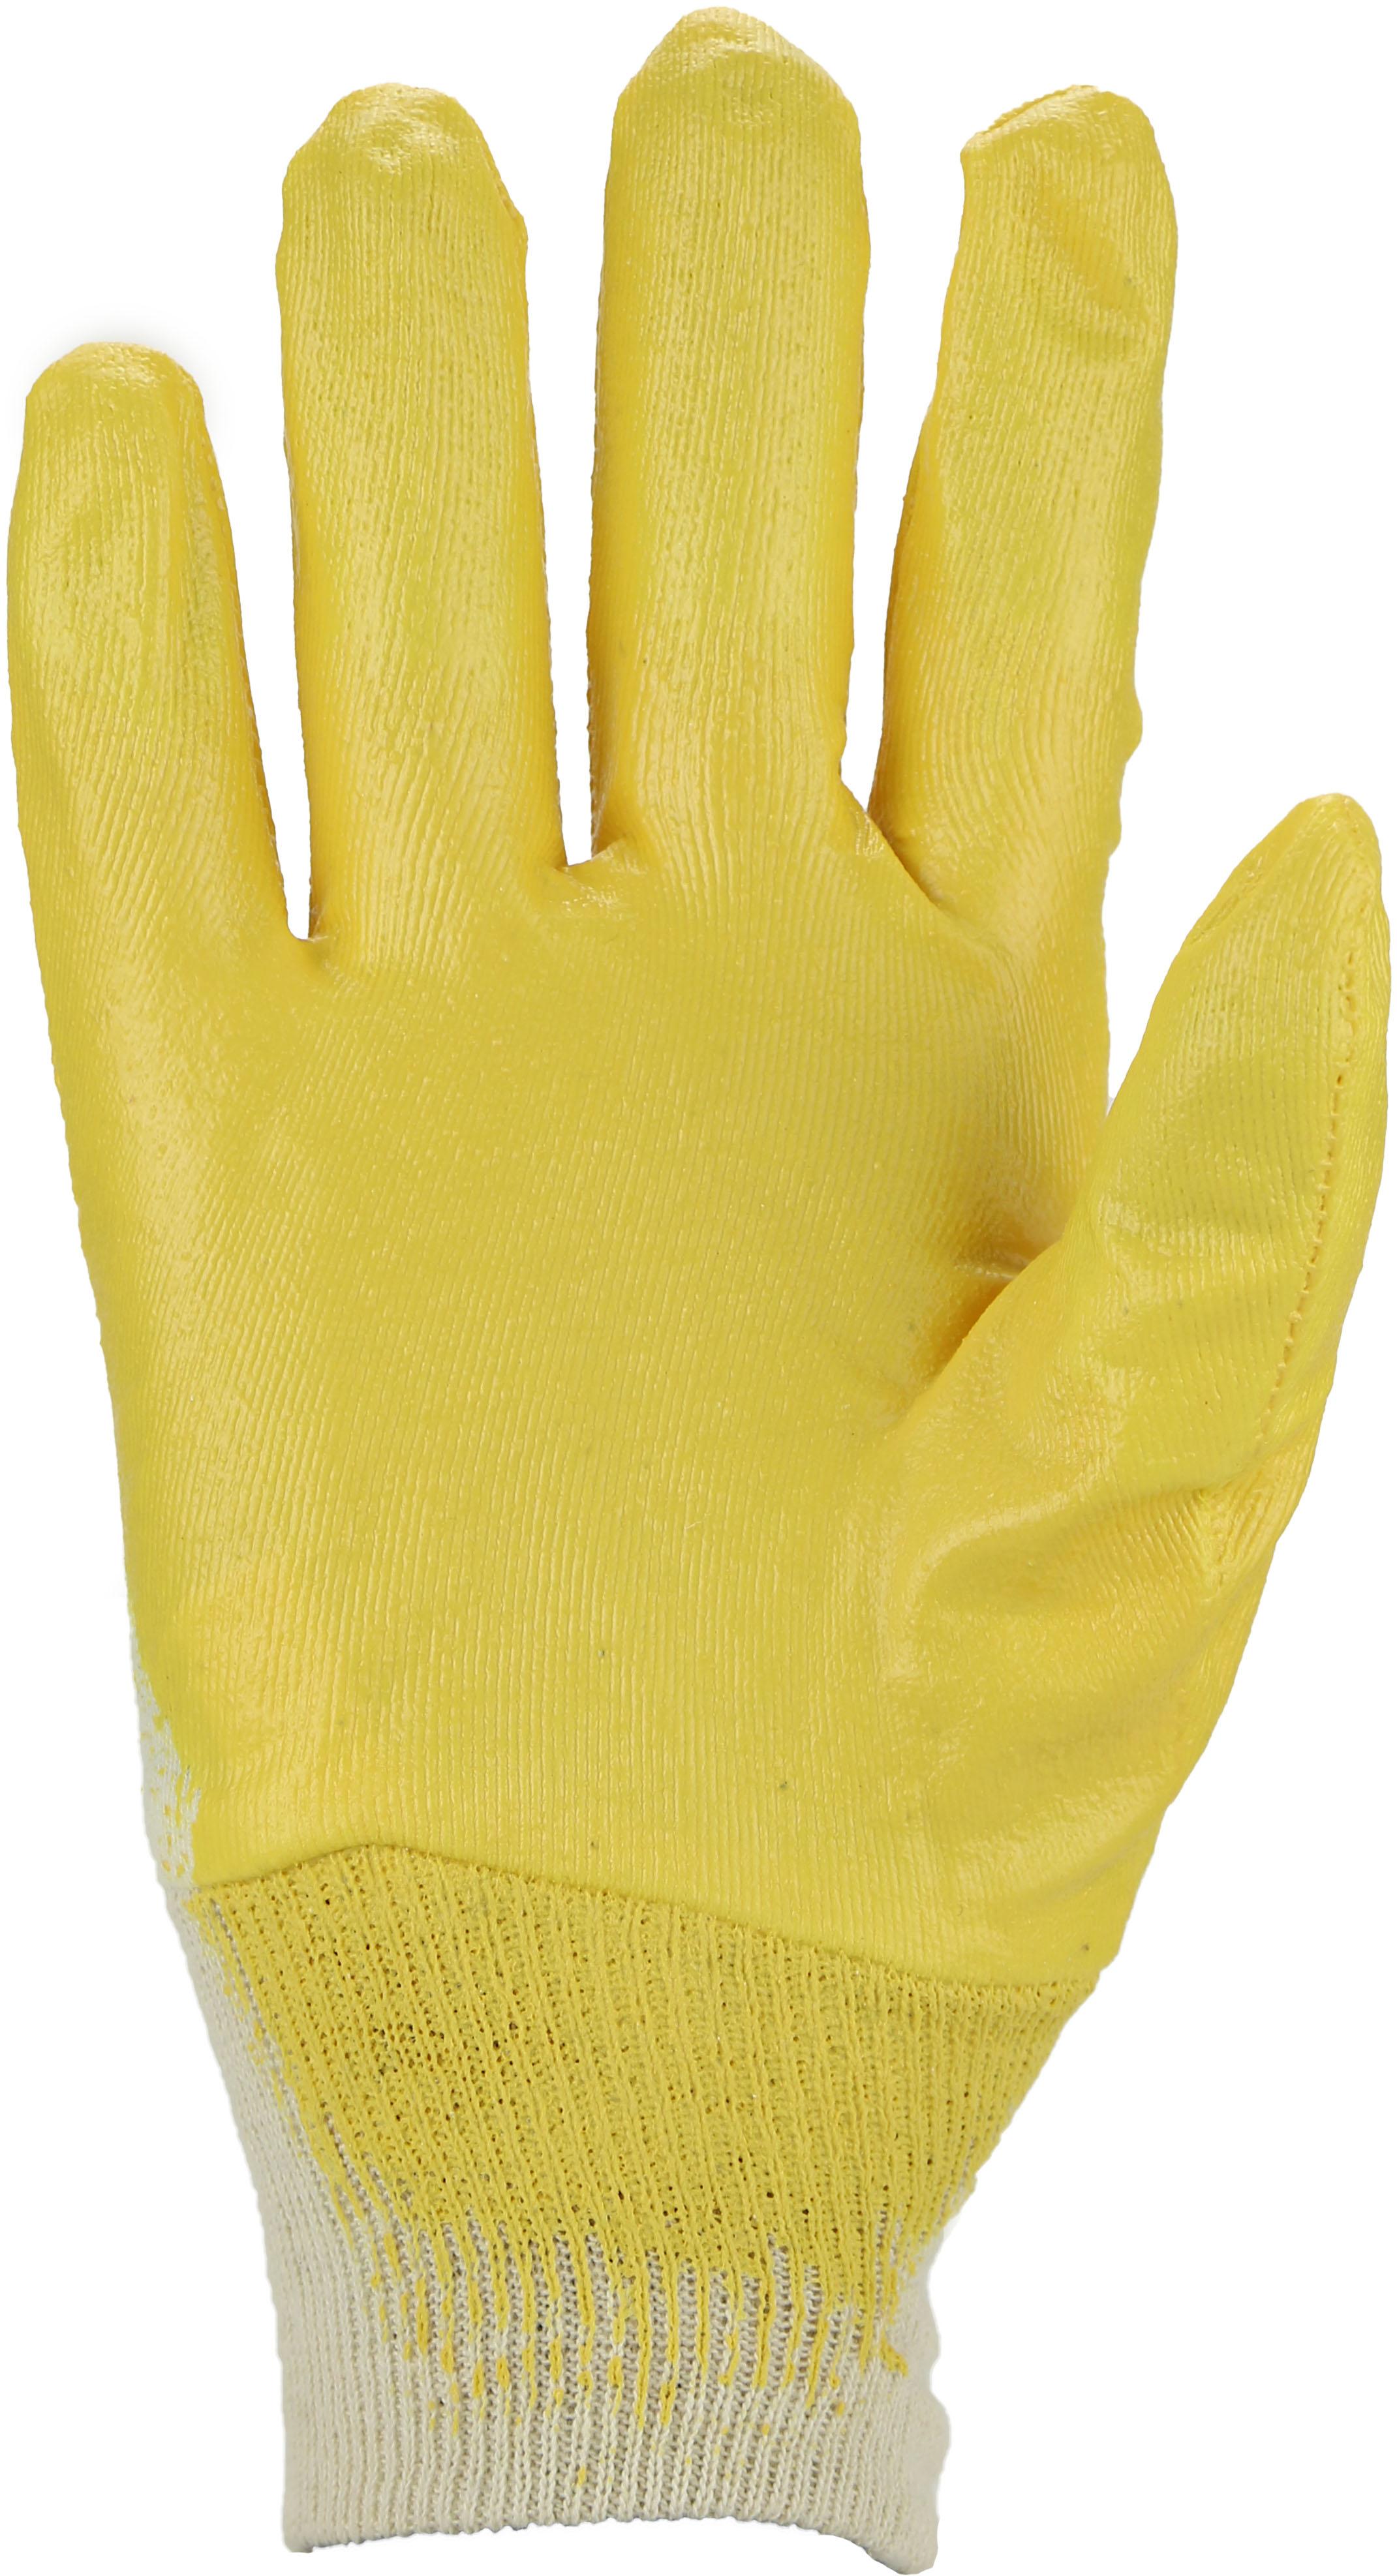 Gr ASATEX Nitril-Handschuh 03400P gelb 8 12 Paar